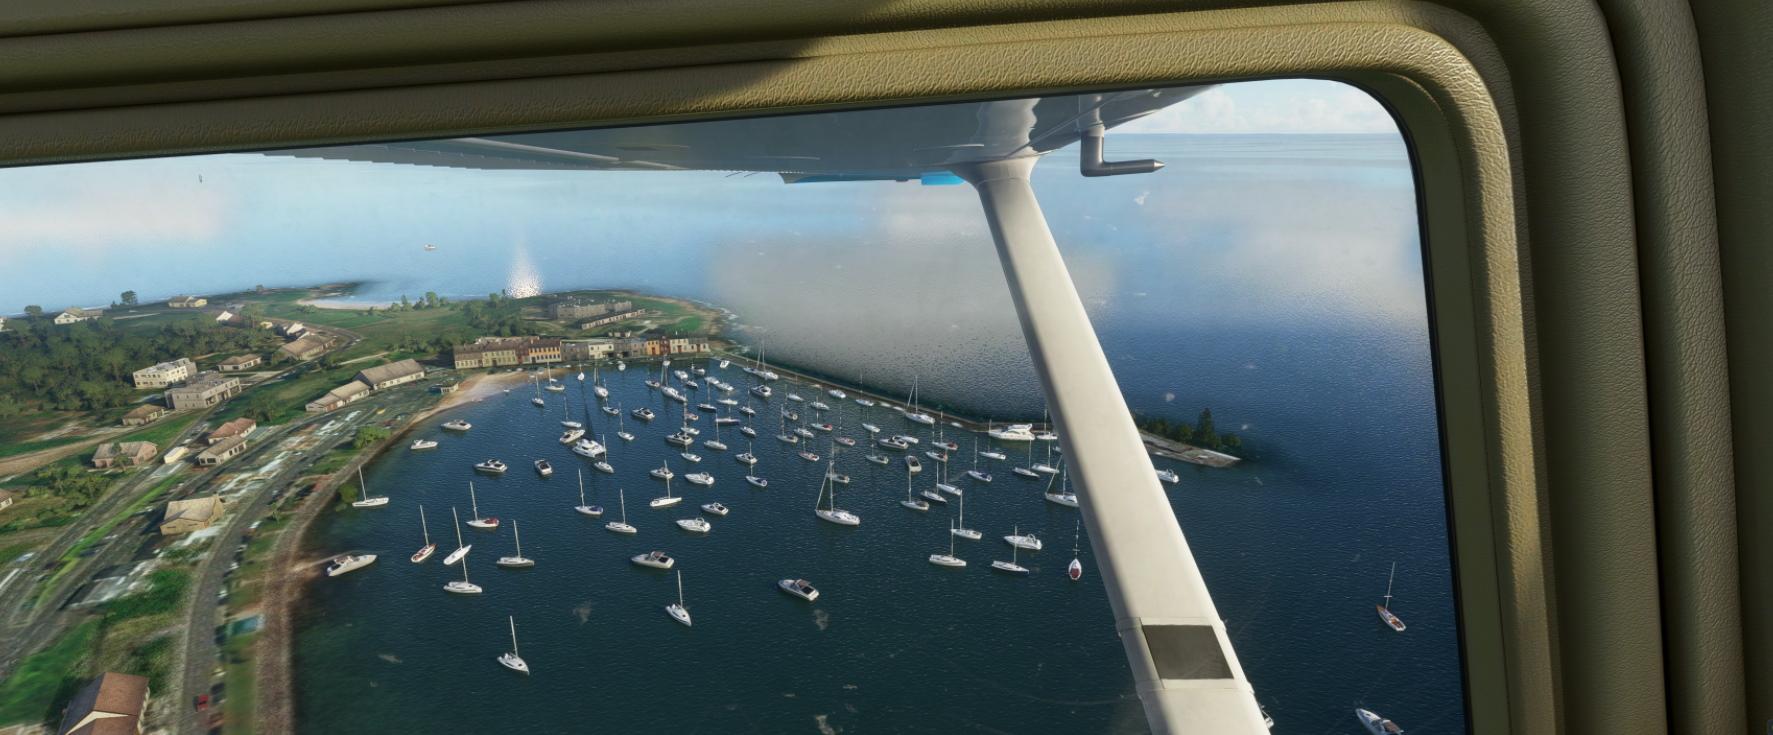 Microsoft Flight Simulator Seafront Simulations Orbx Vessels Channel Islands